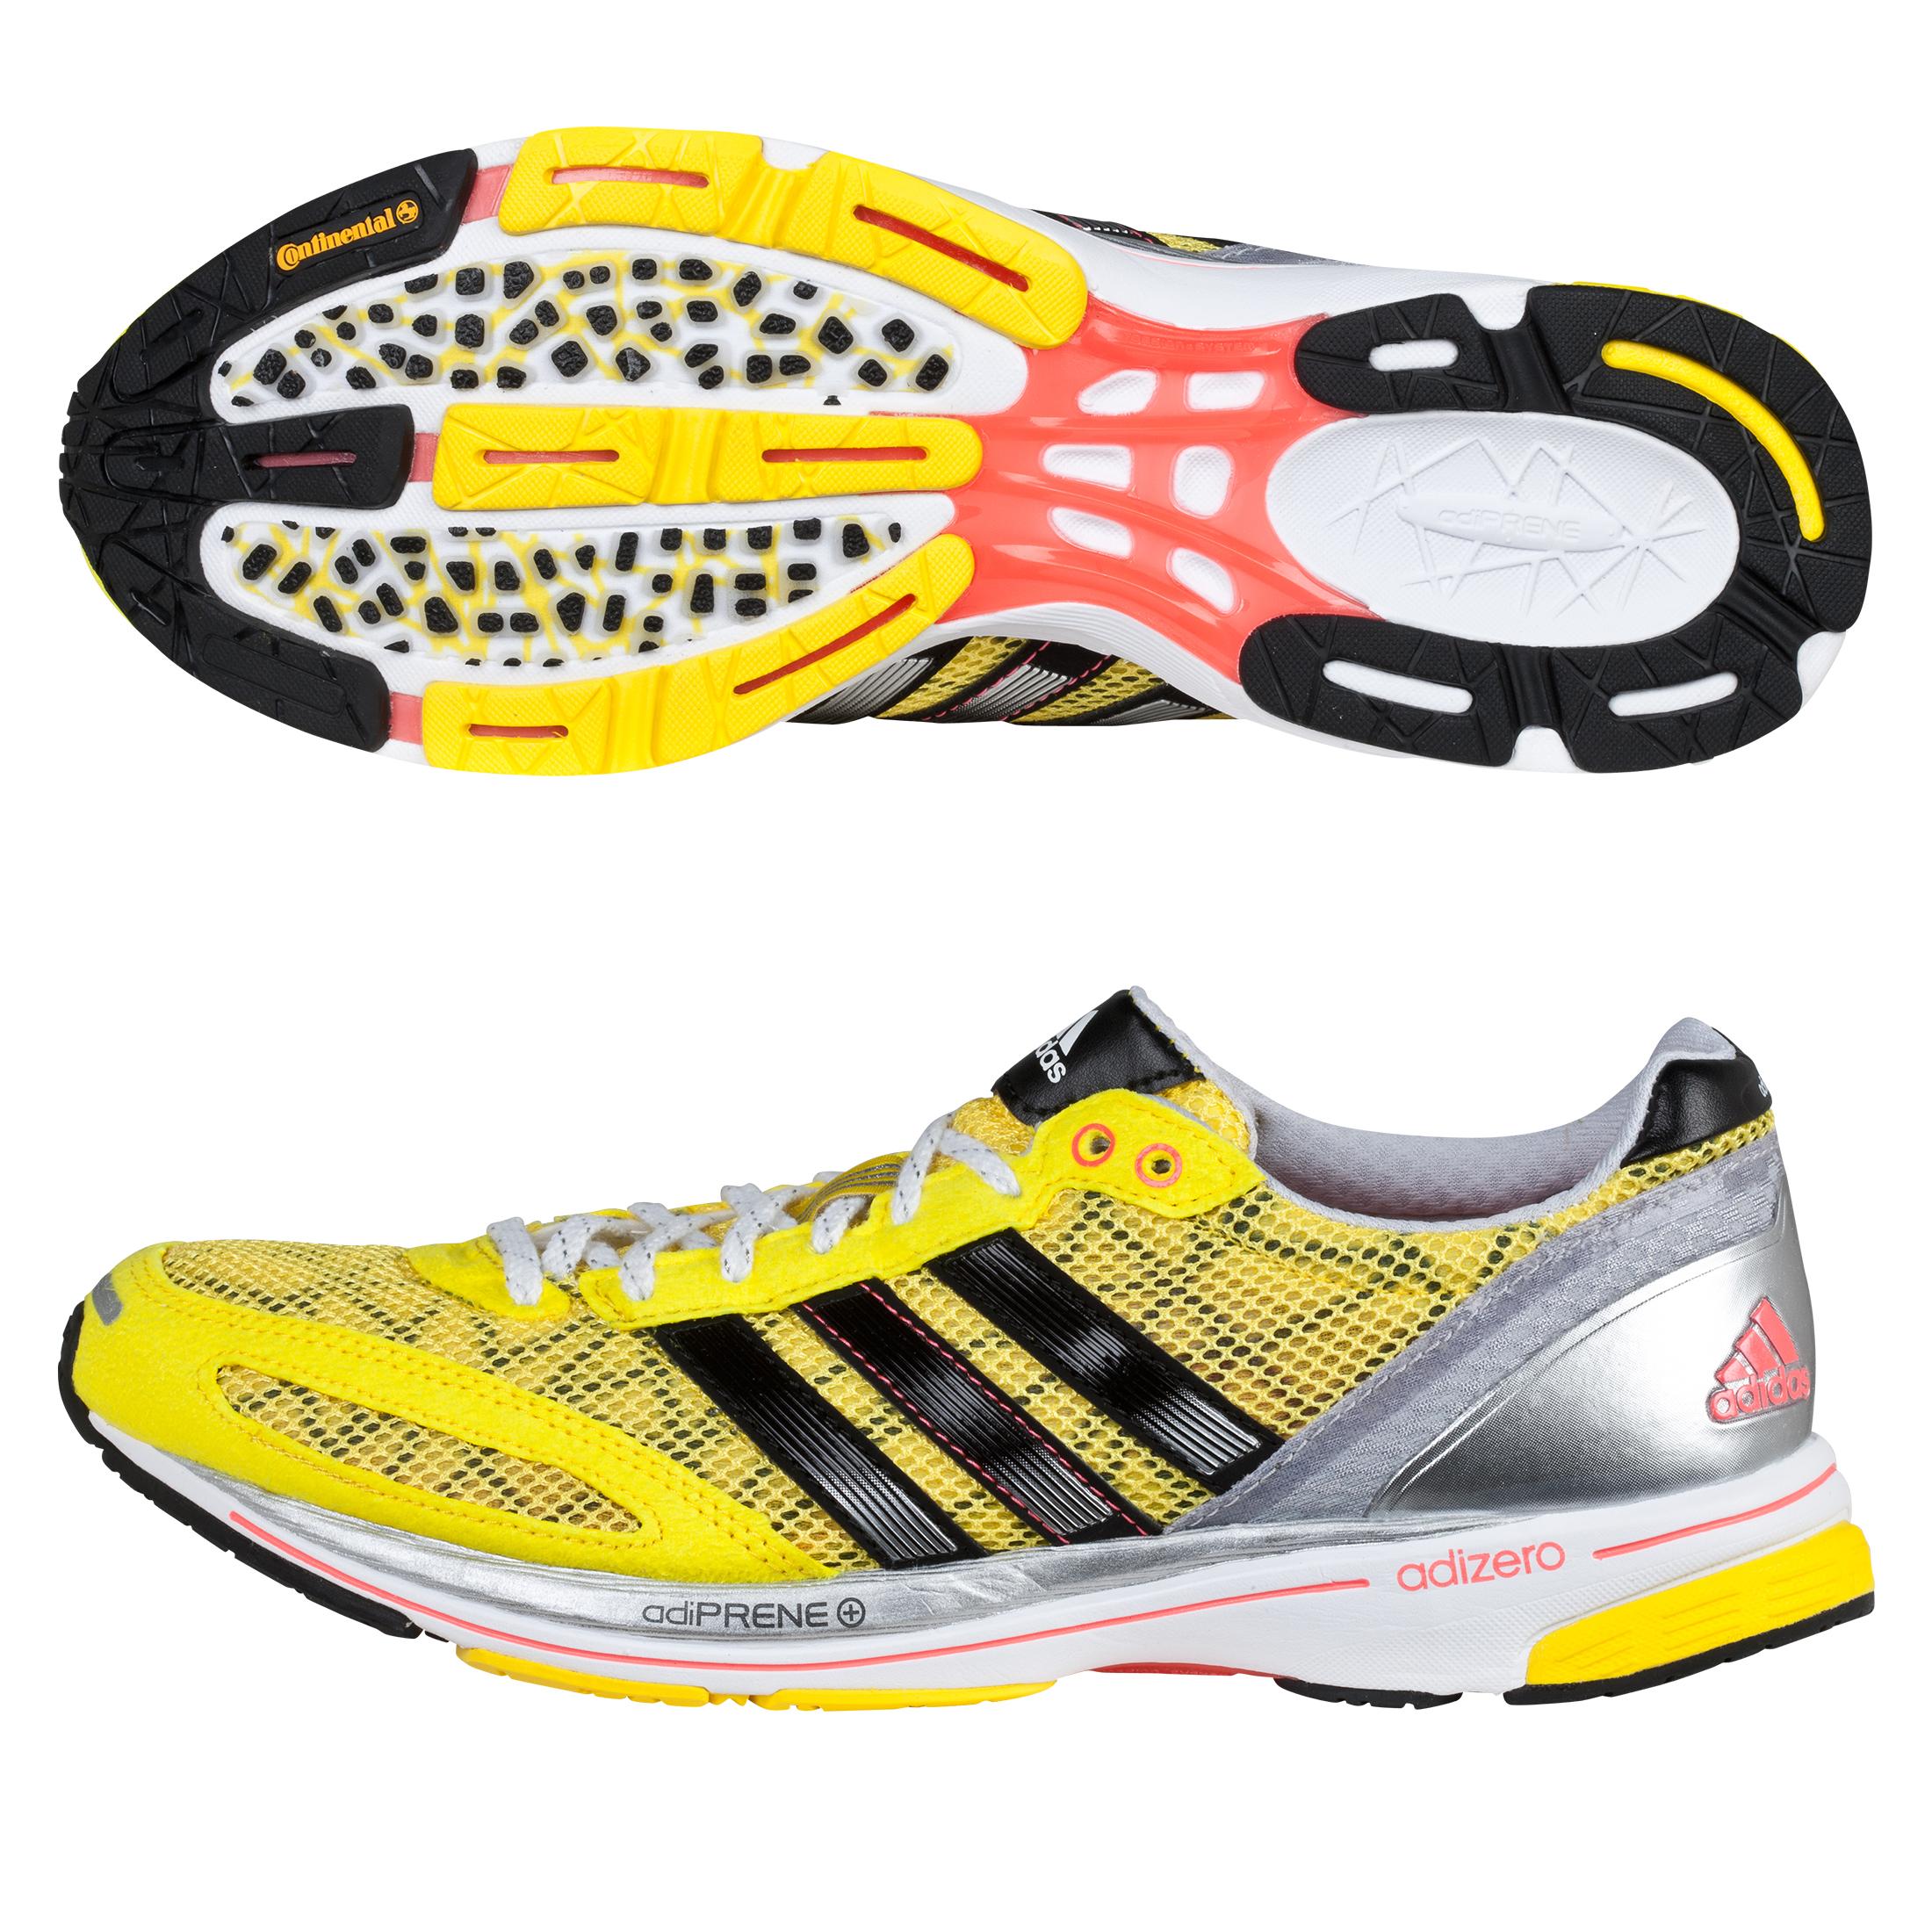 Adidas Adizero Adios 2 Trainer - Womens